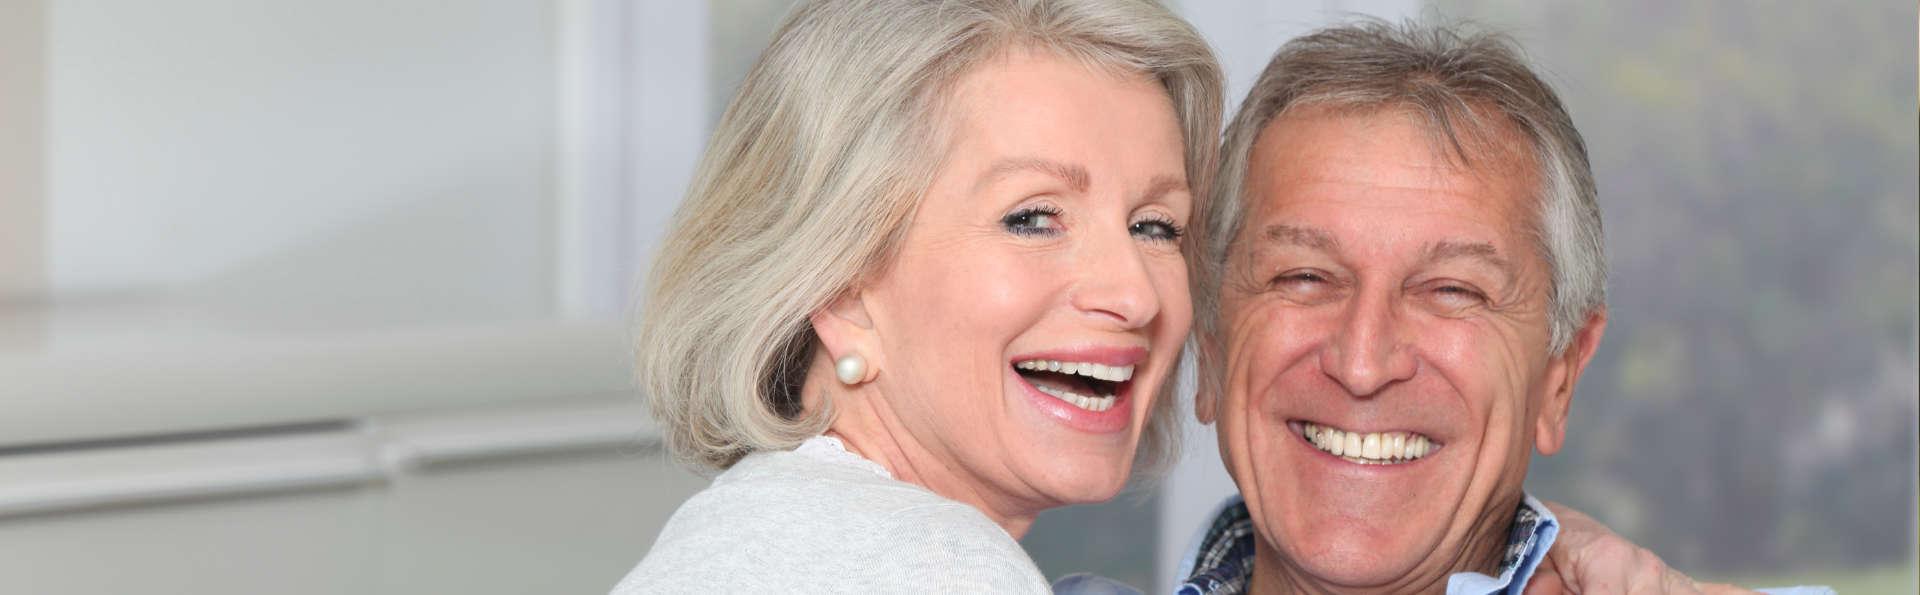 smiling elderly couple